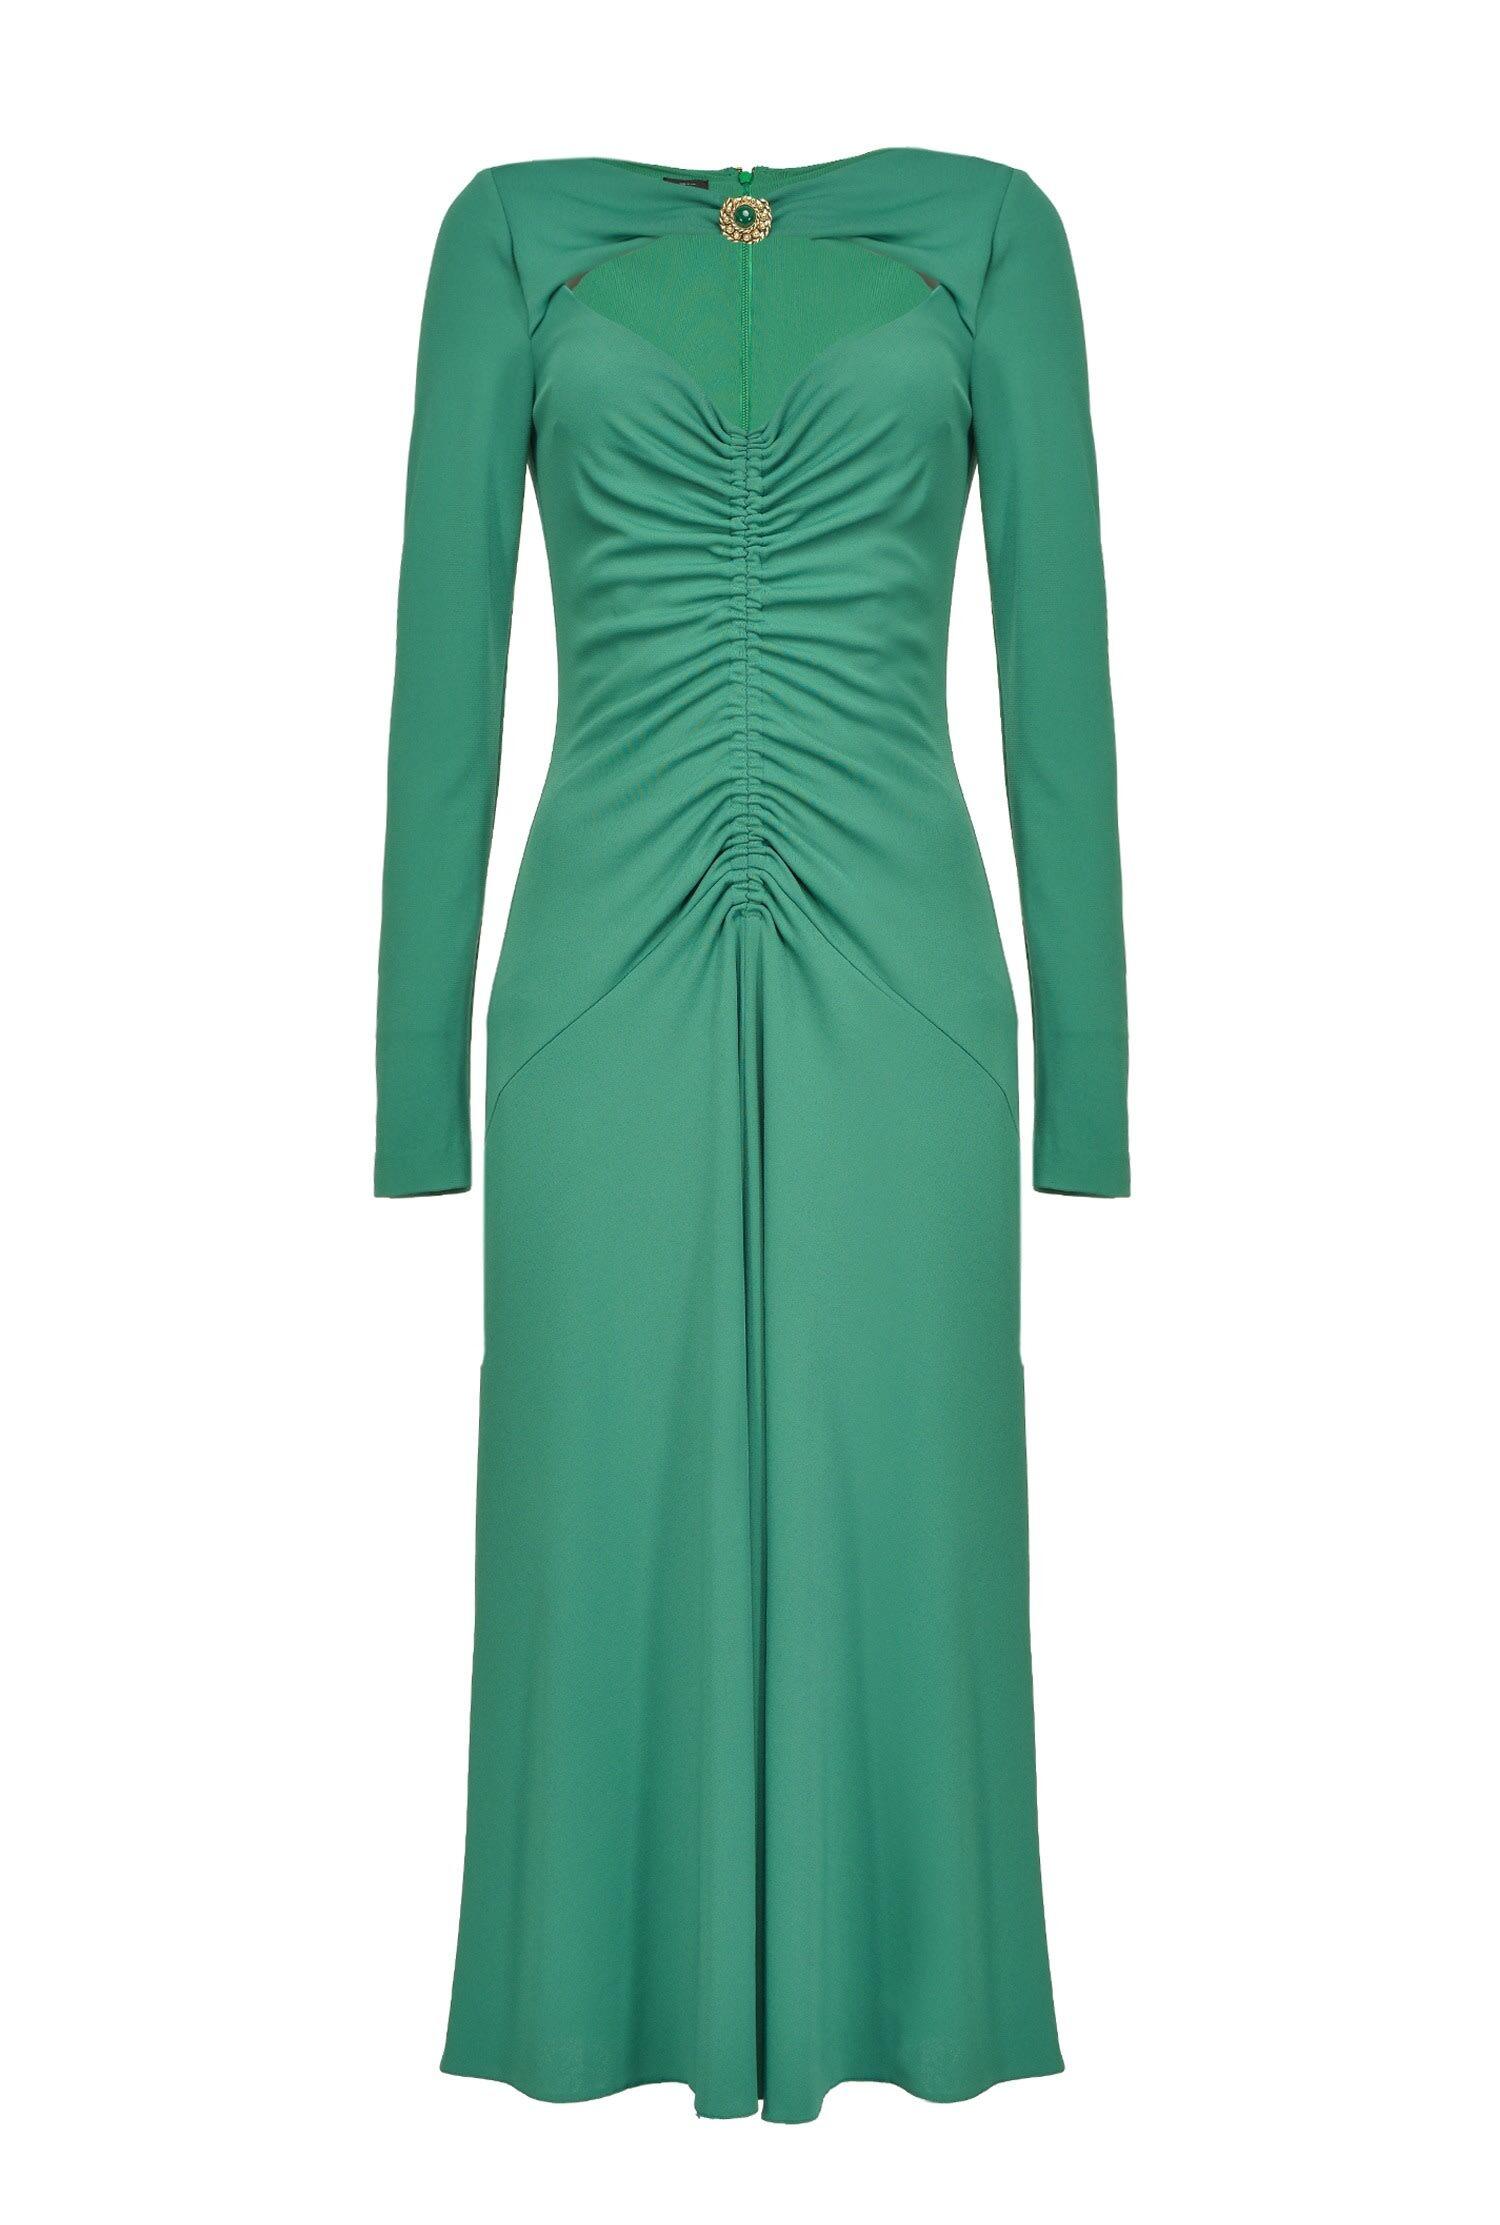 Dress With Jewel Brooch - Pinko